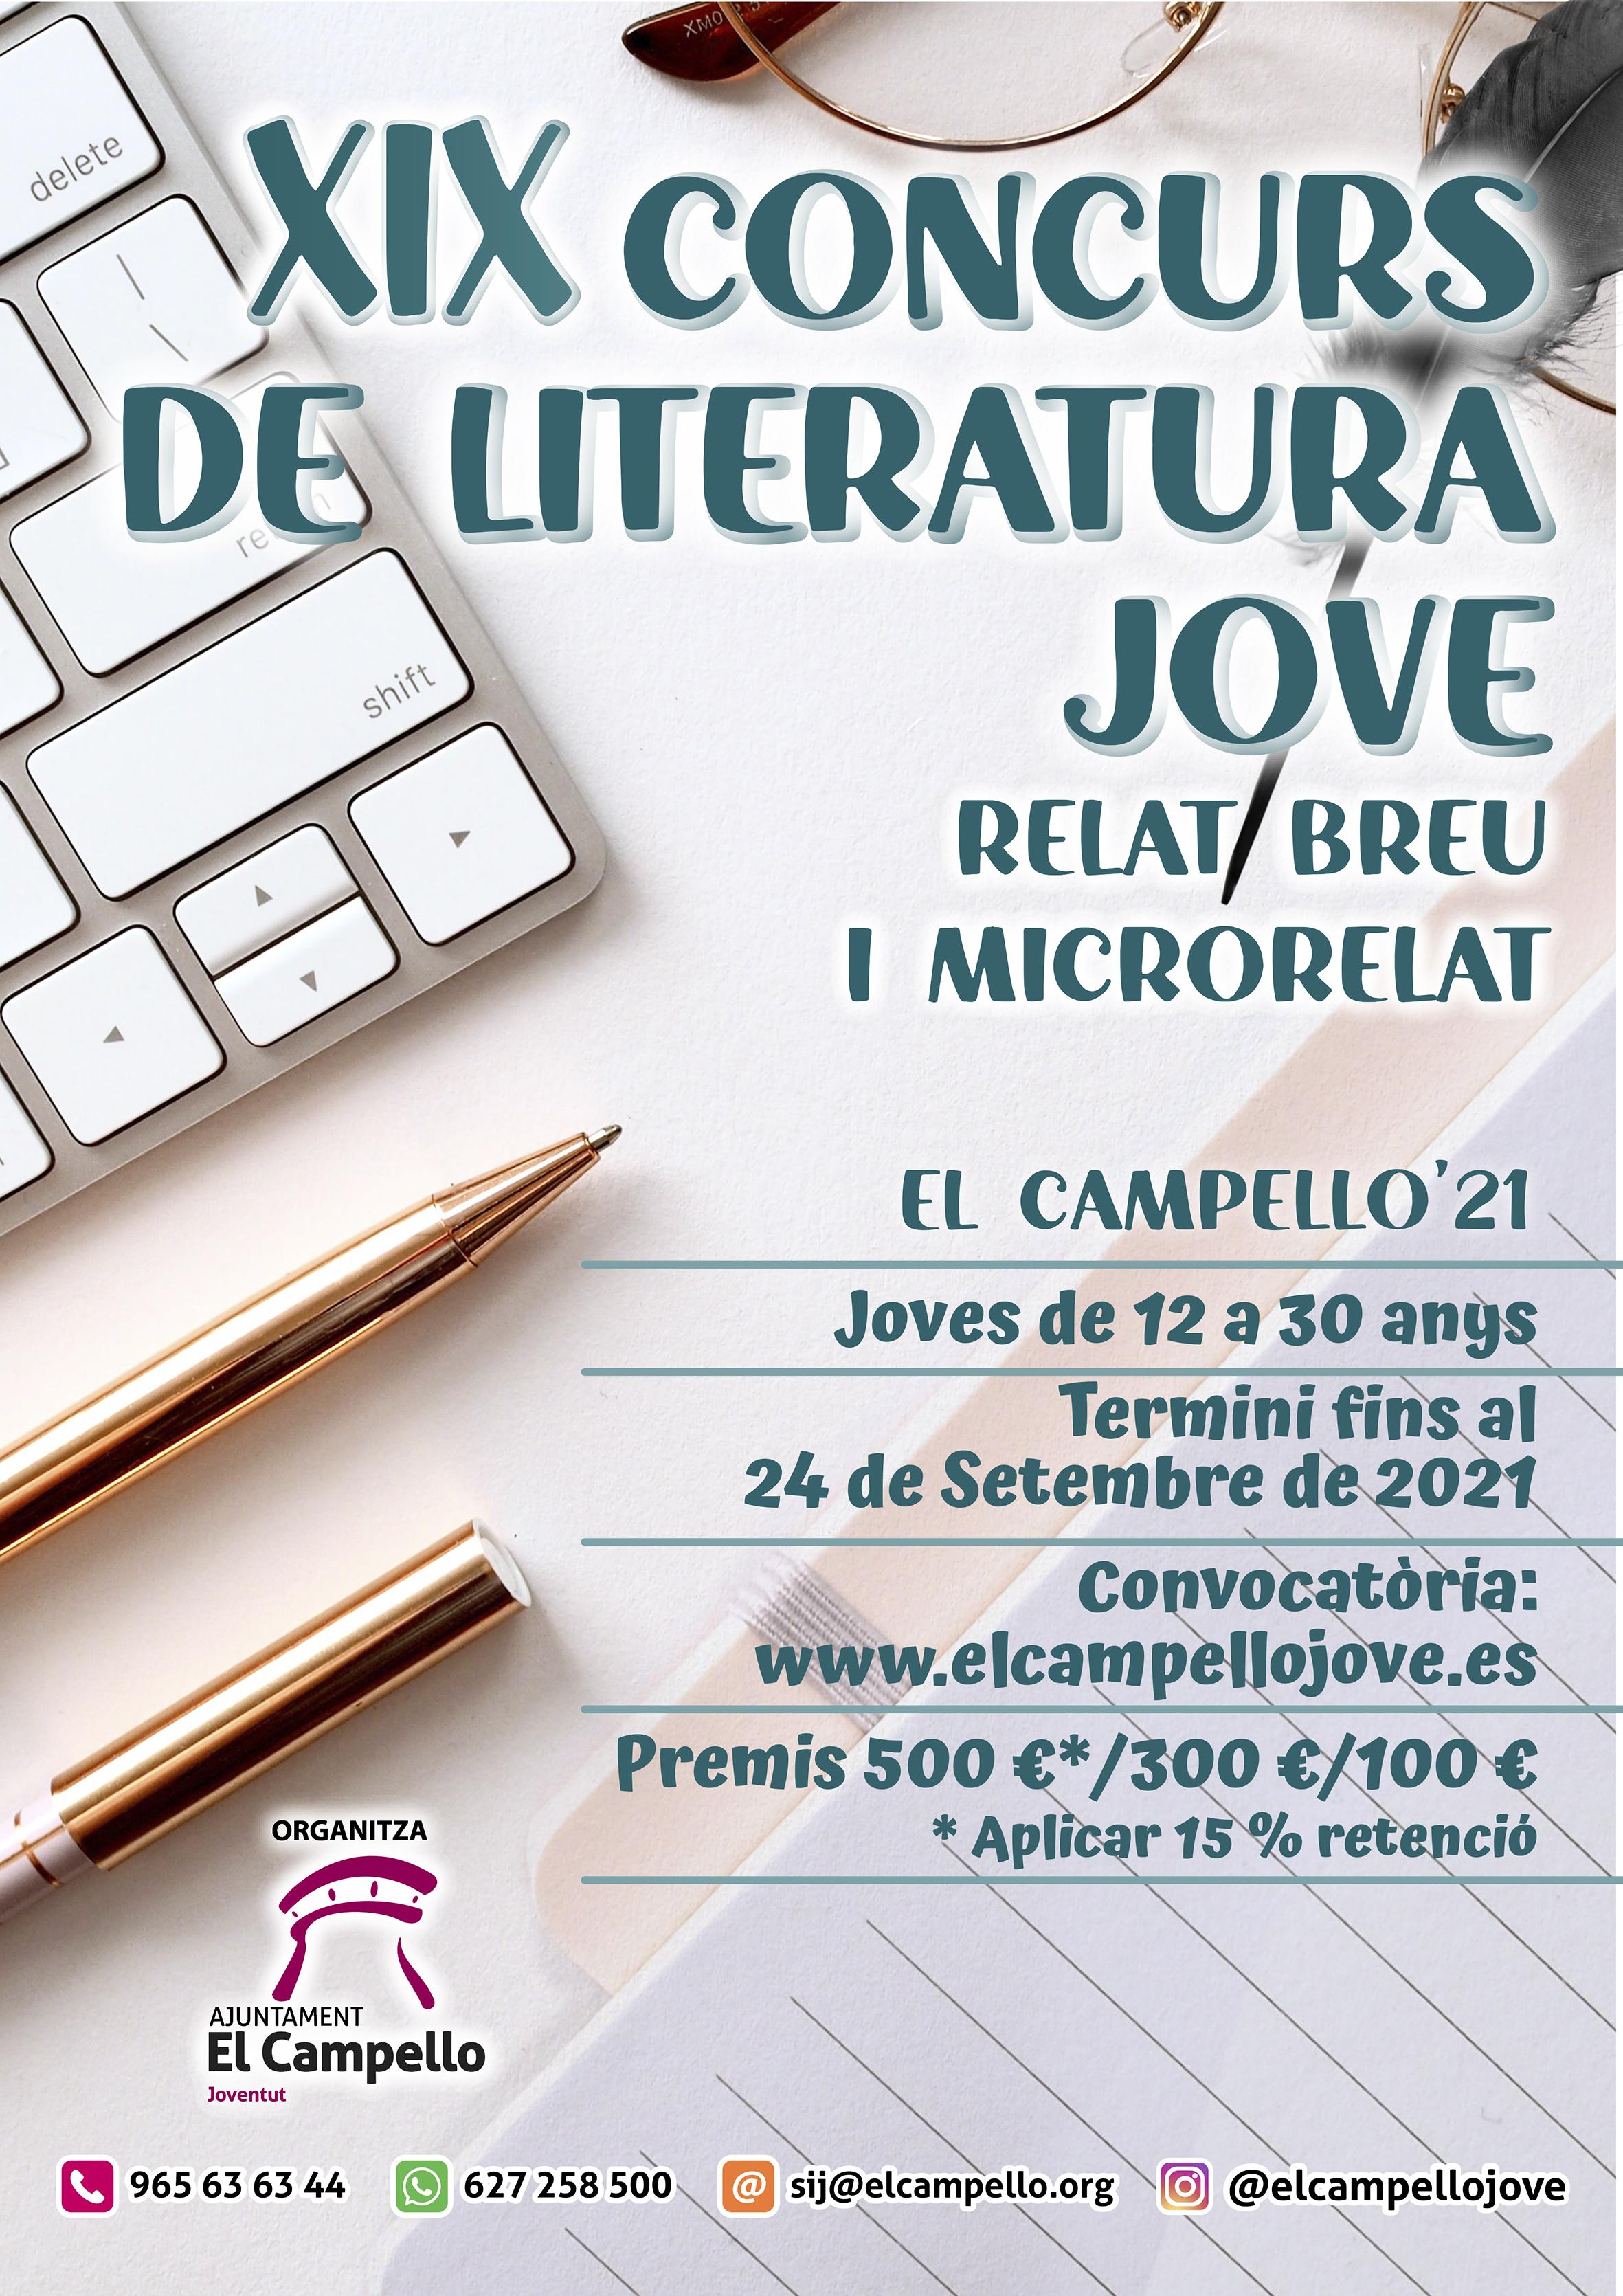 XIX Concurso de Literatura Joven . Relato breve y microrrelato.